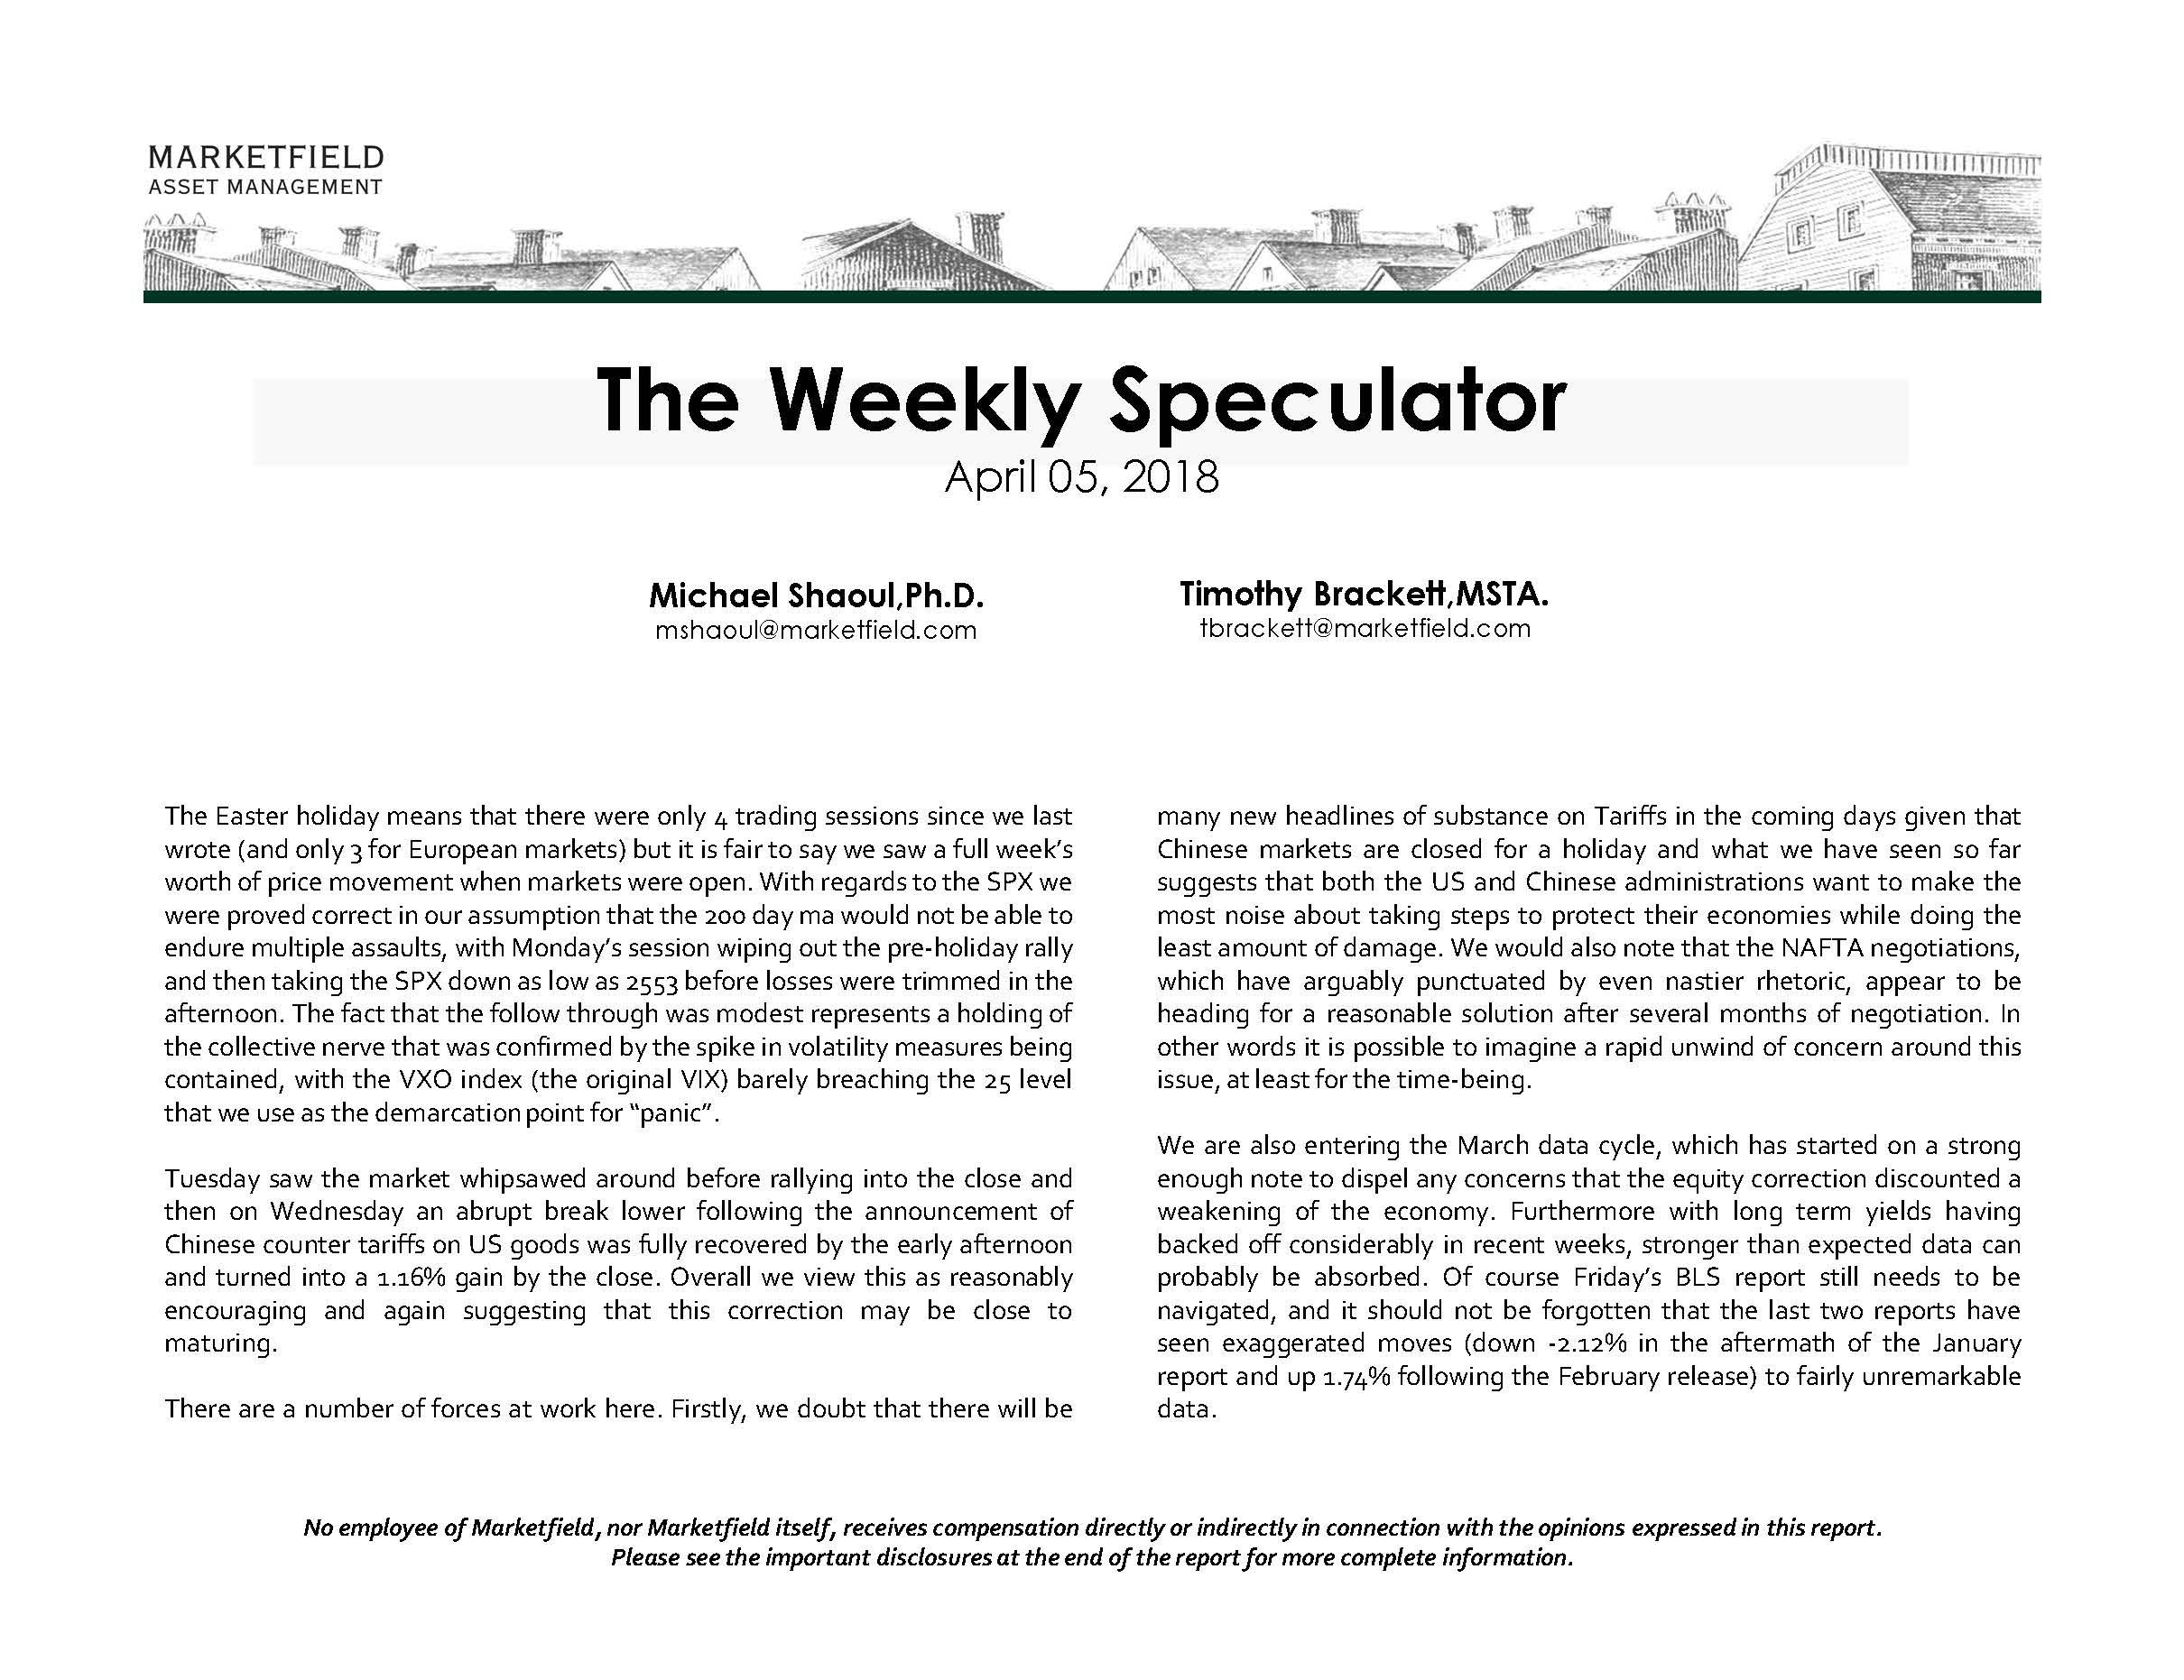 April 5_Marketfield Weekly Speculator_Page_01.jpg